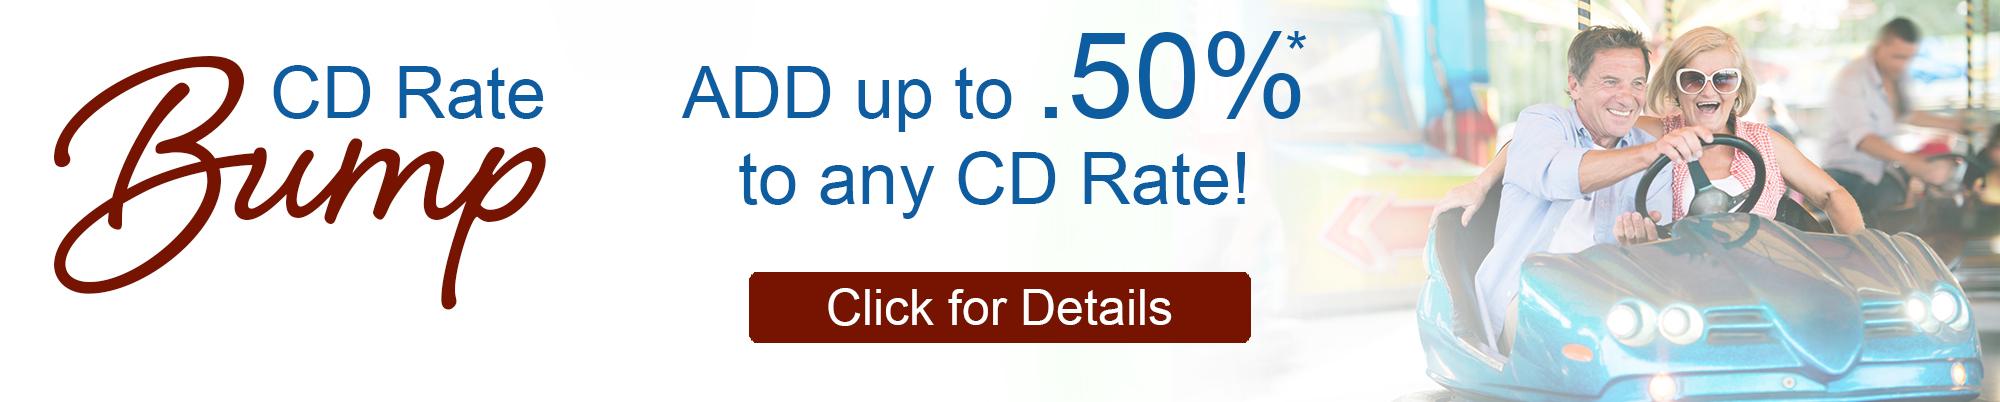 CD Rate Bump